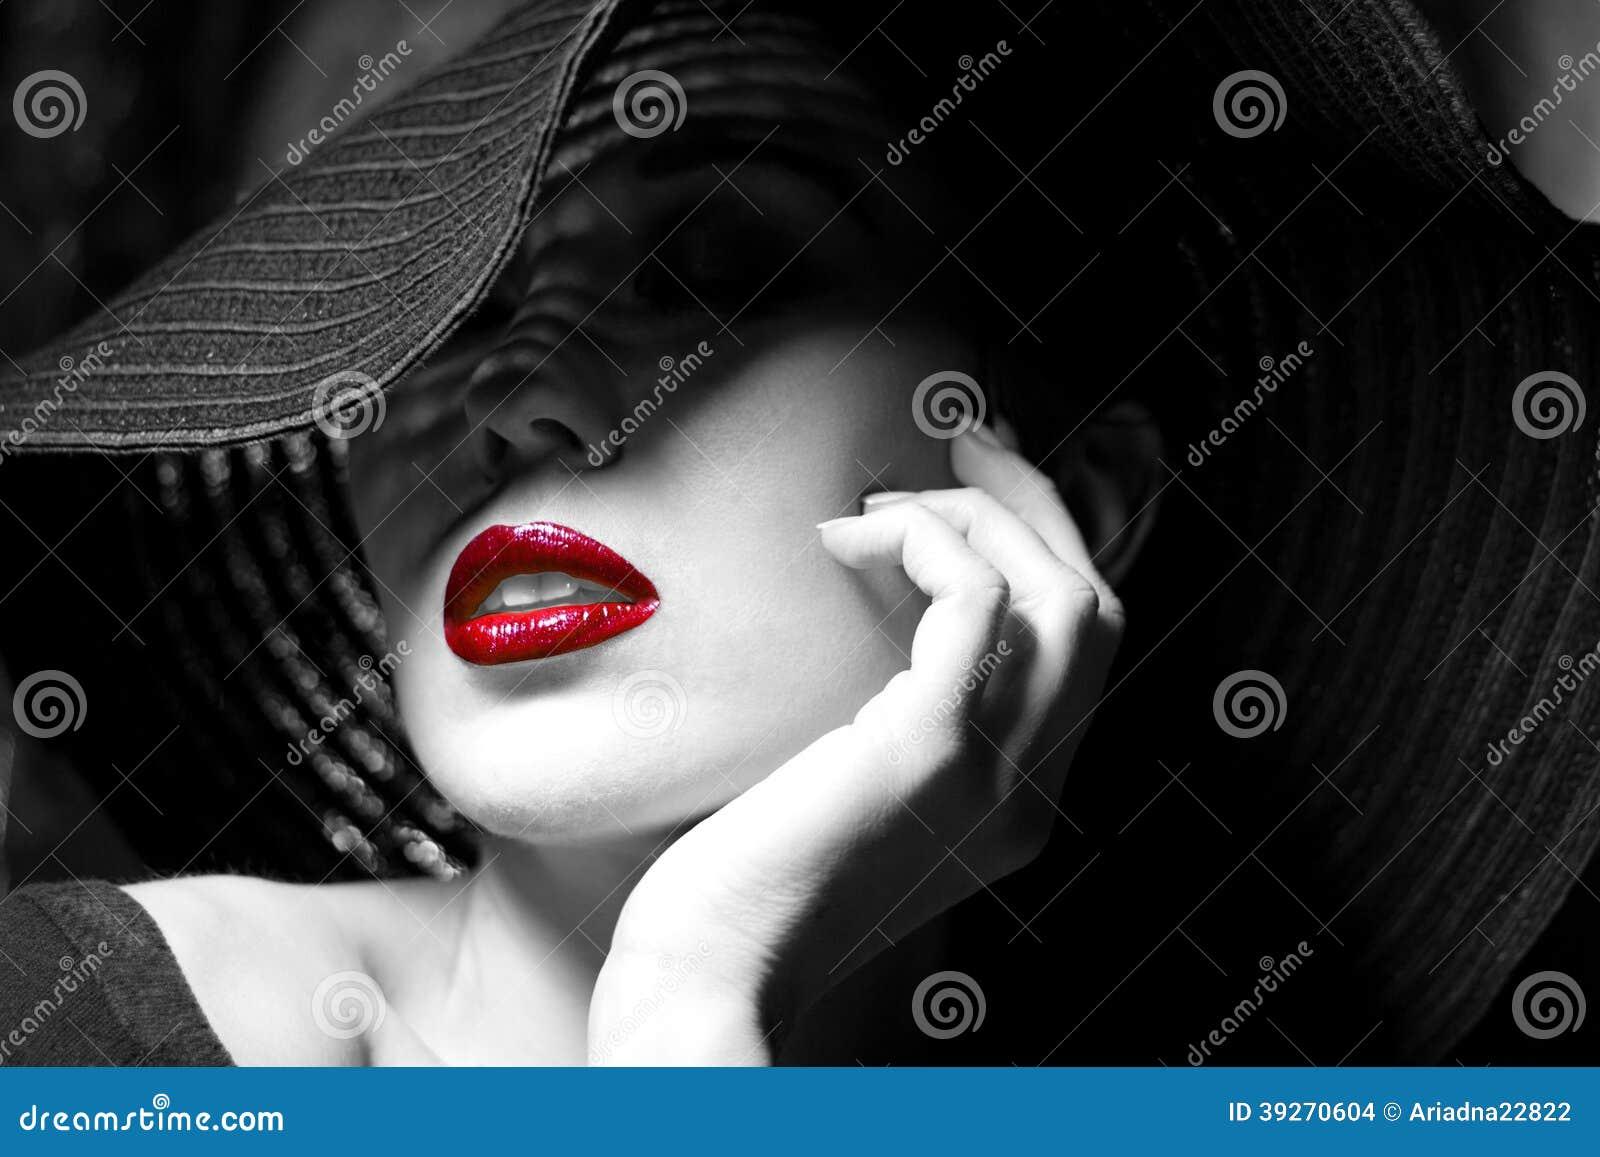 Geheimzinnige vrouw in zwarte hoed. Rode lippen